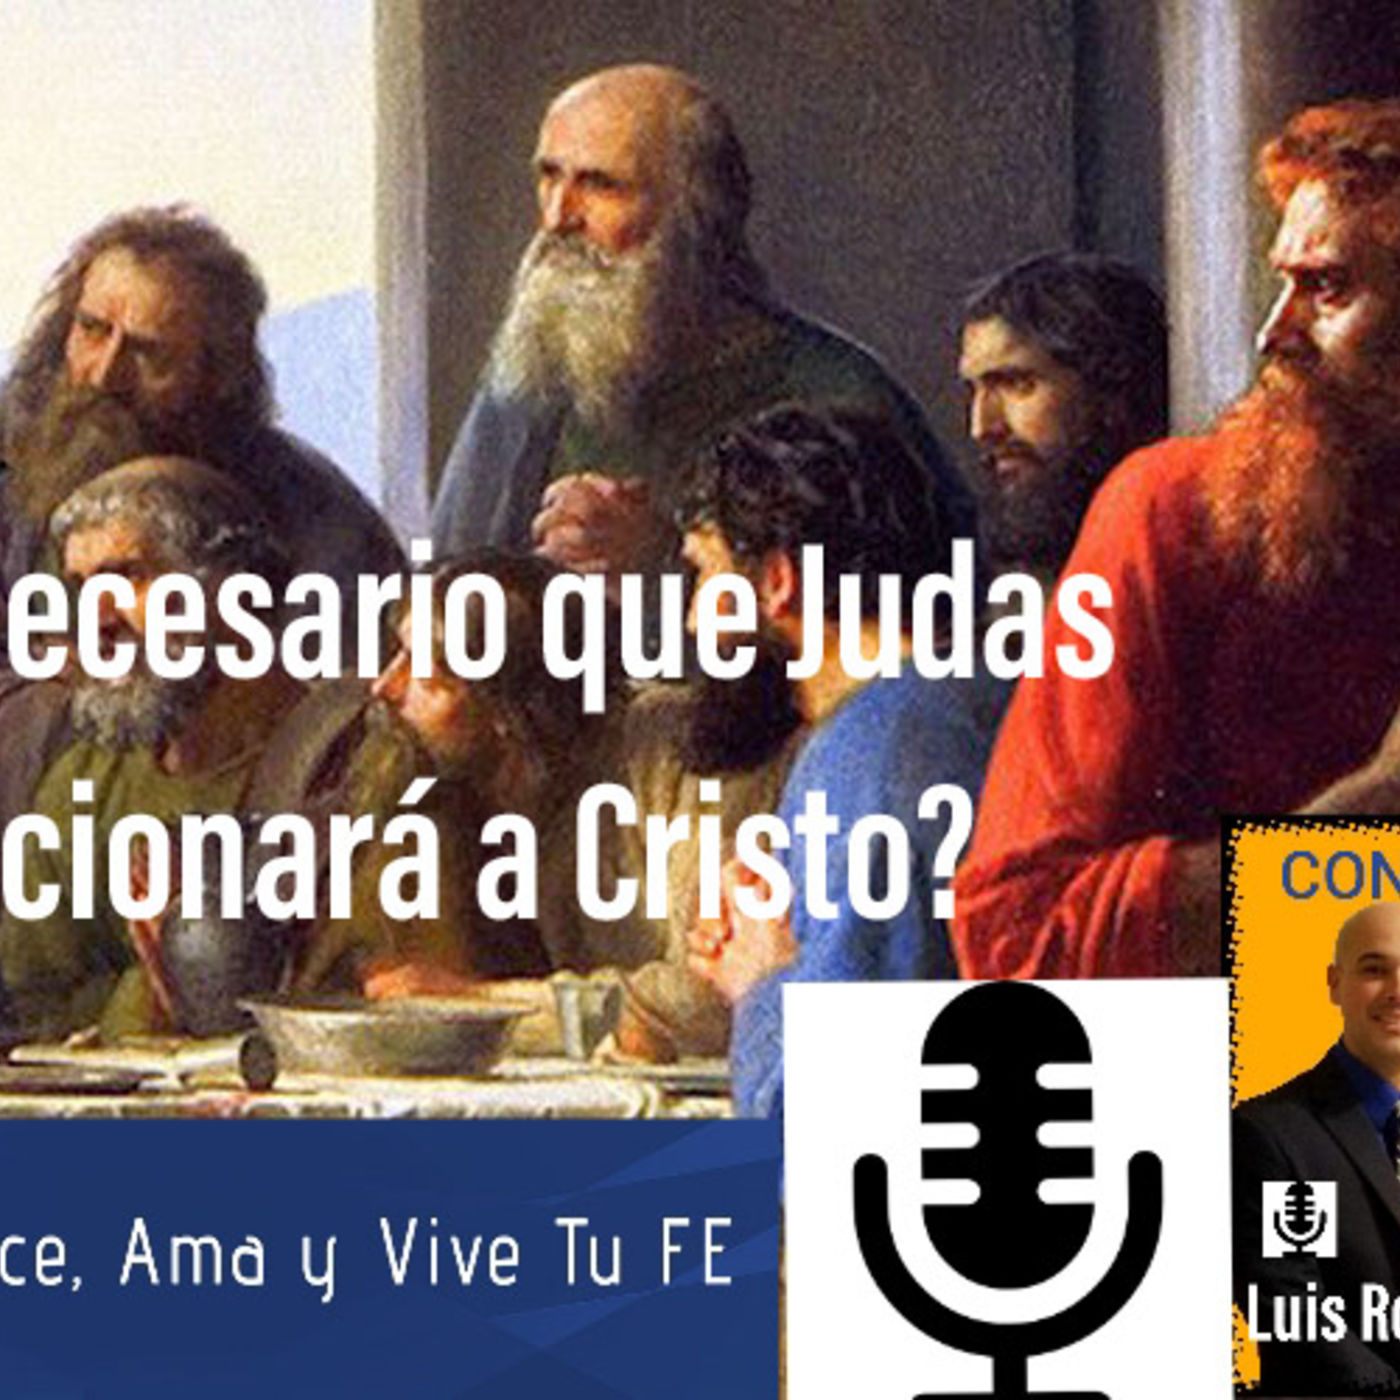 Episodio 33: ¿ Era necesario que Judas traicionará a Cristo?